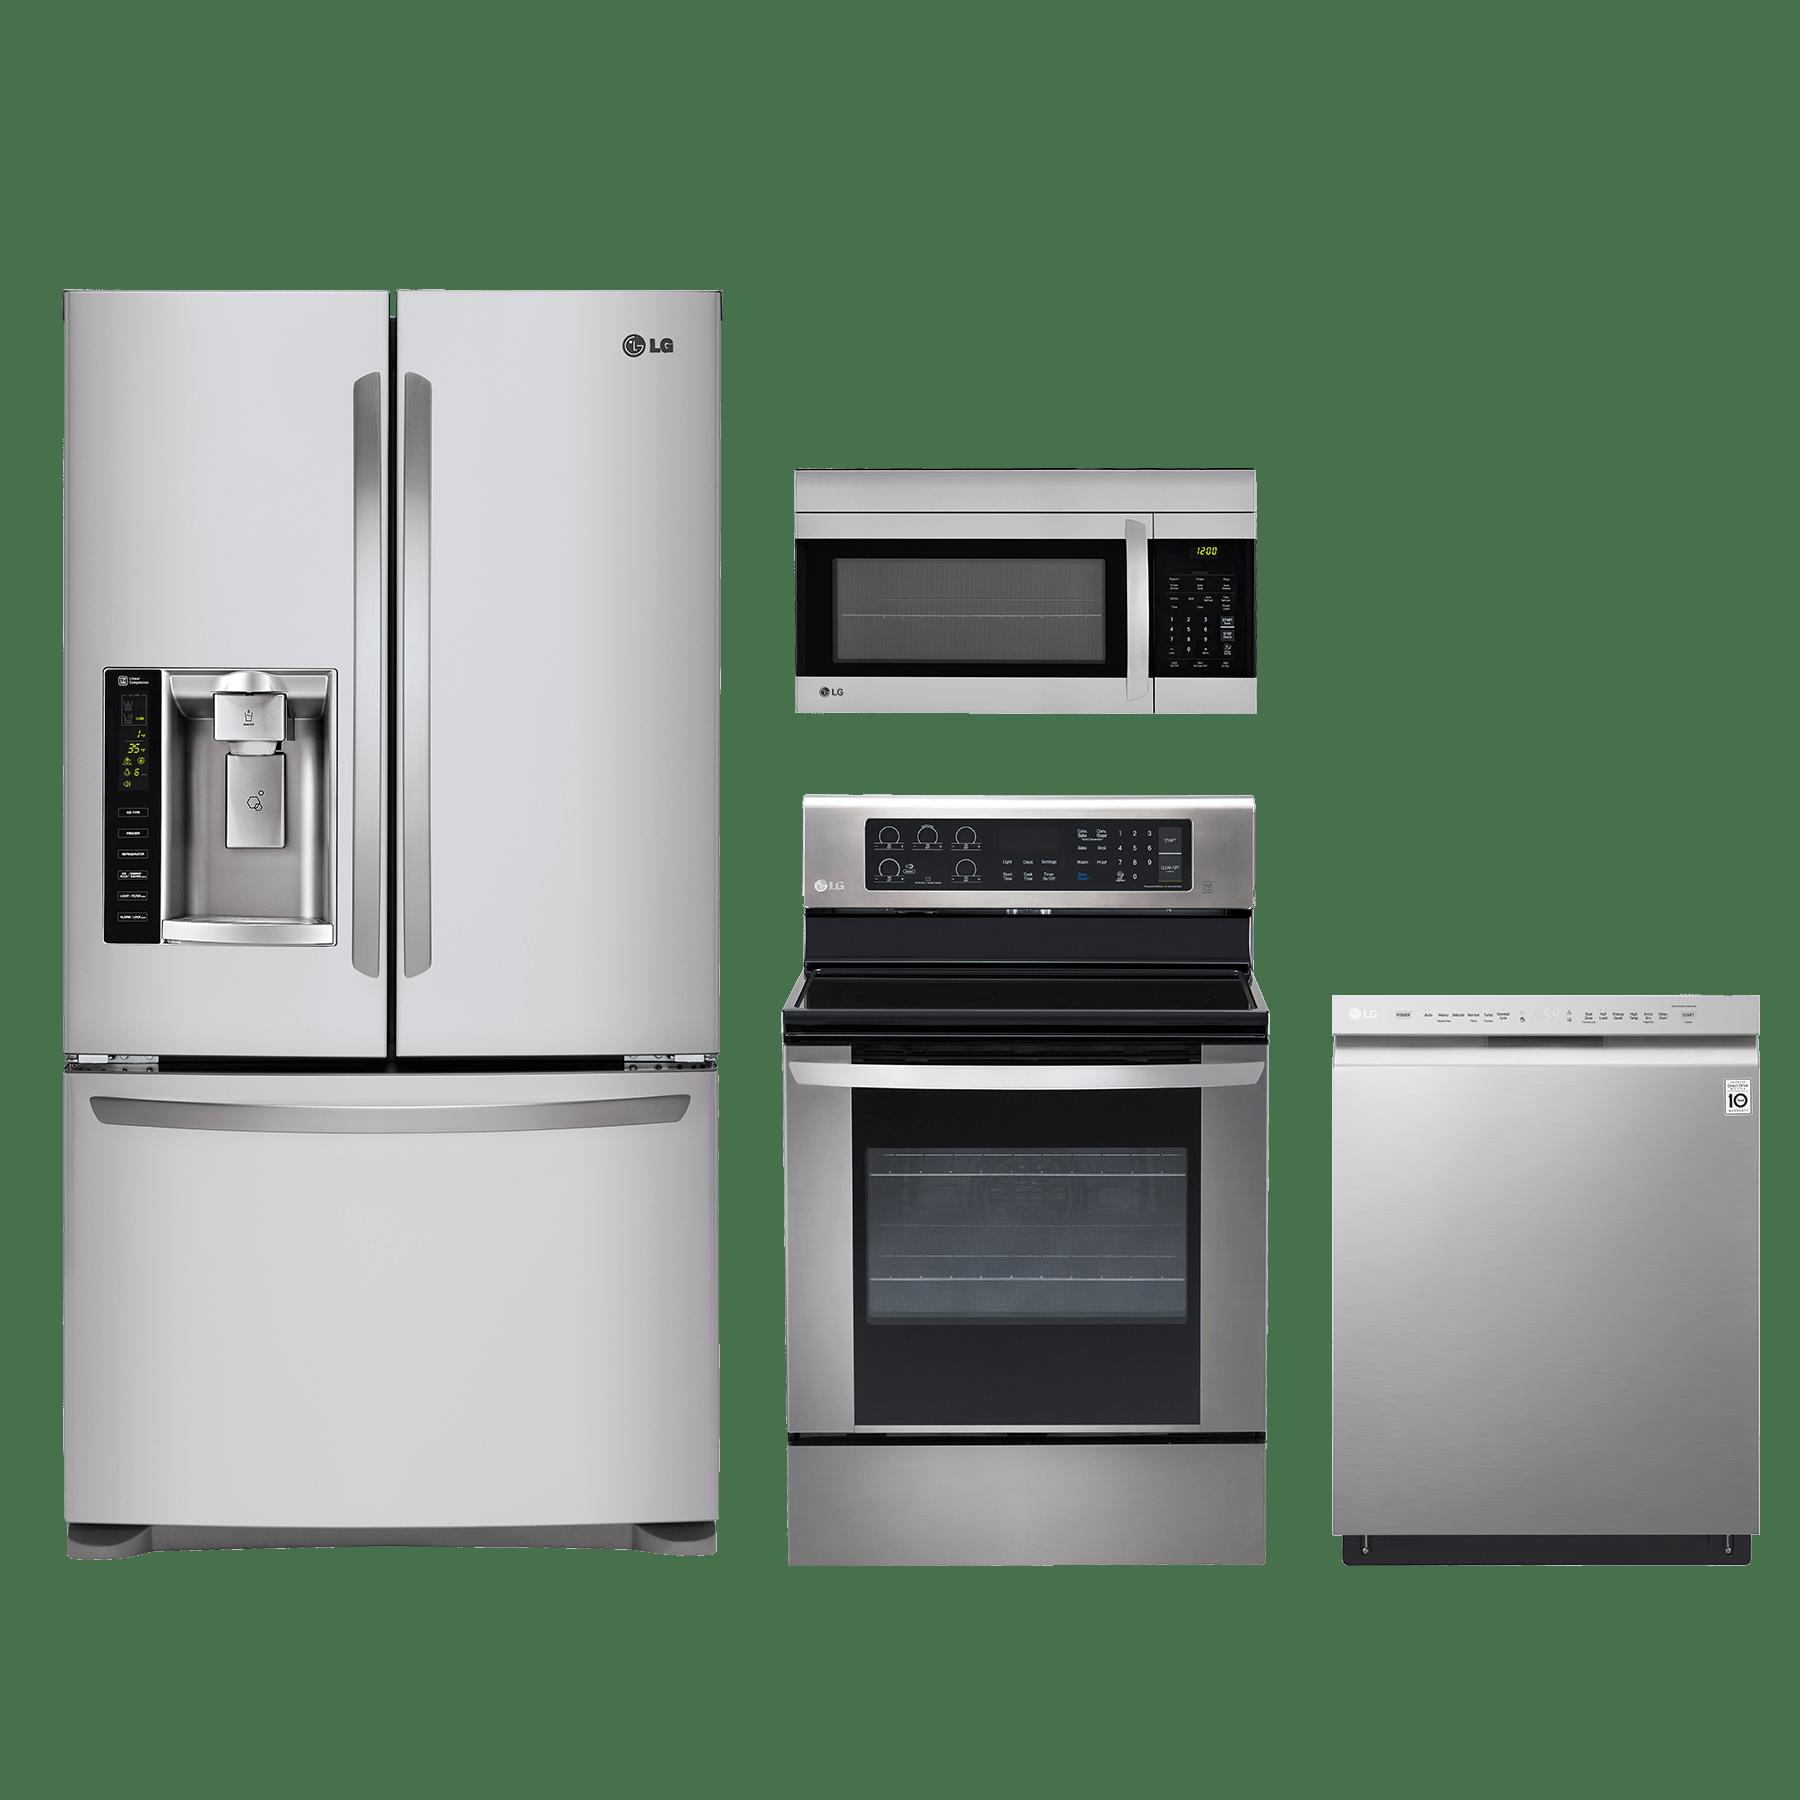 lg 4 piece kitchen package stainless steel kitchen appliance packages  rh   bargainsupplyappliance com